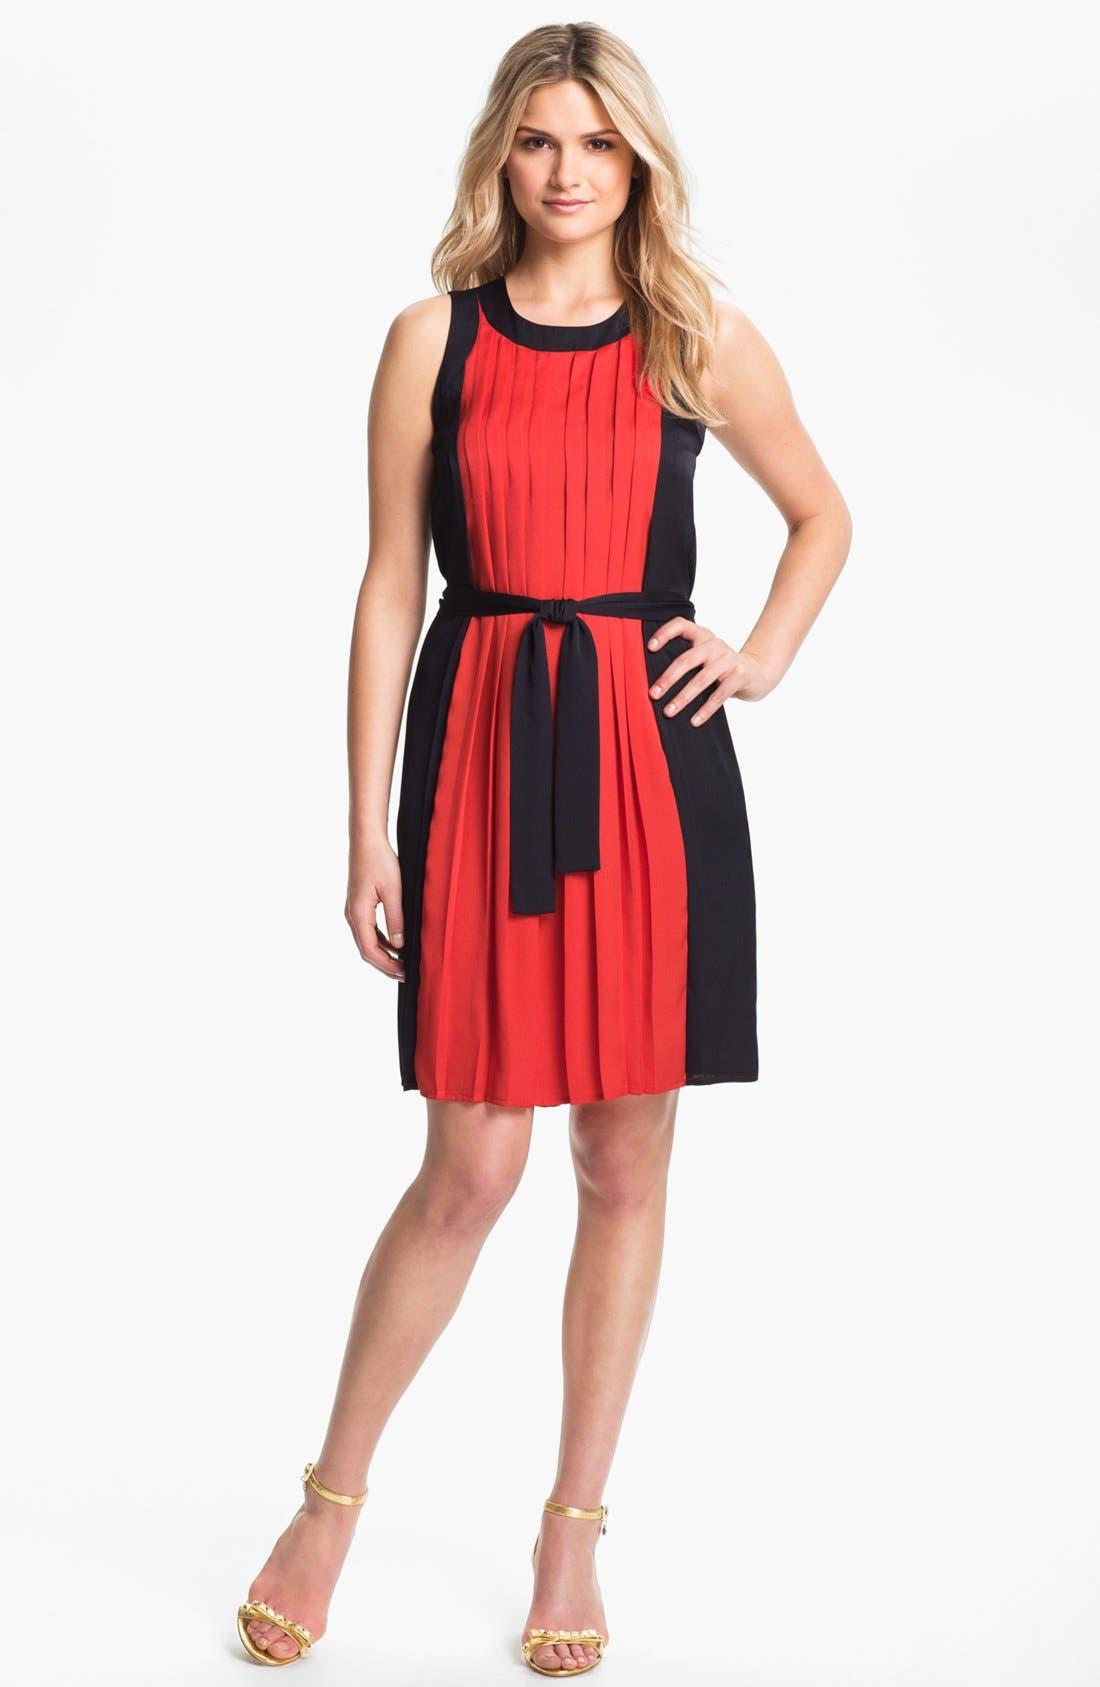 Alternate Image 1 Selected - MICHAEL Michael Kors Pleated Colorblock Dress (Petite)